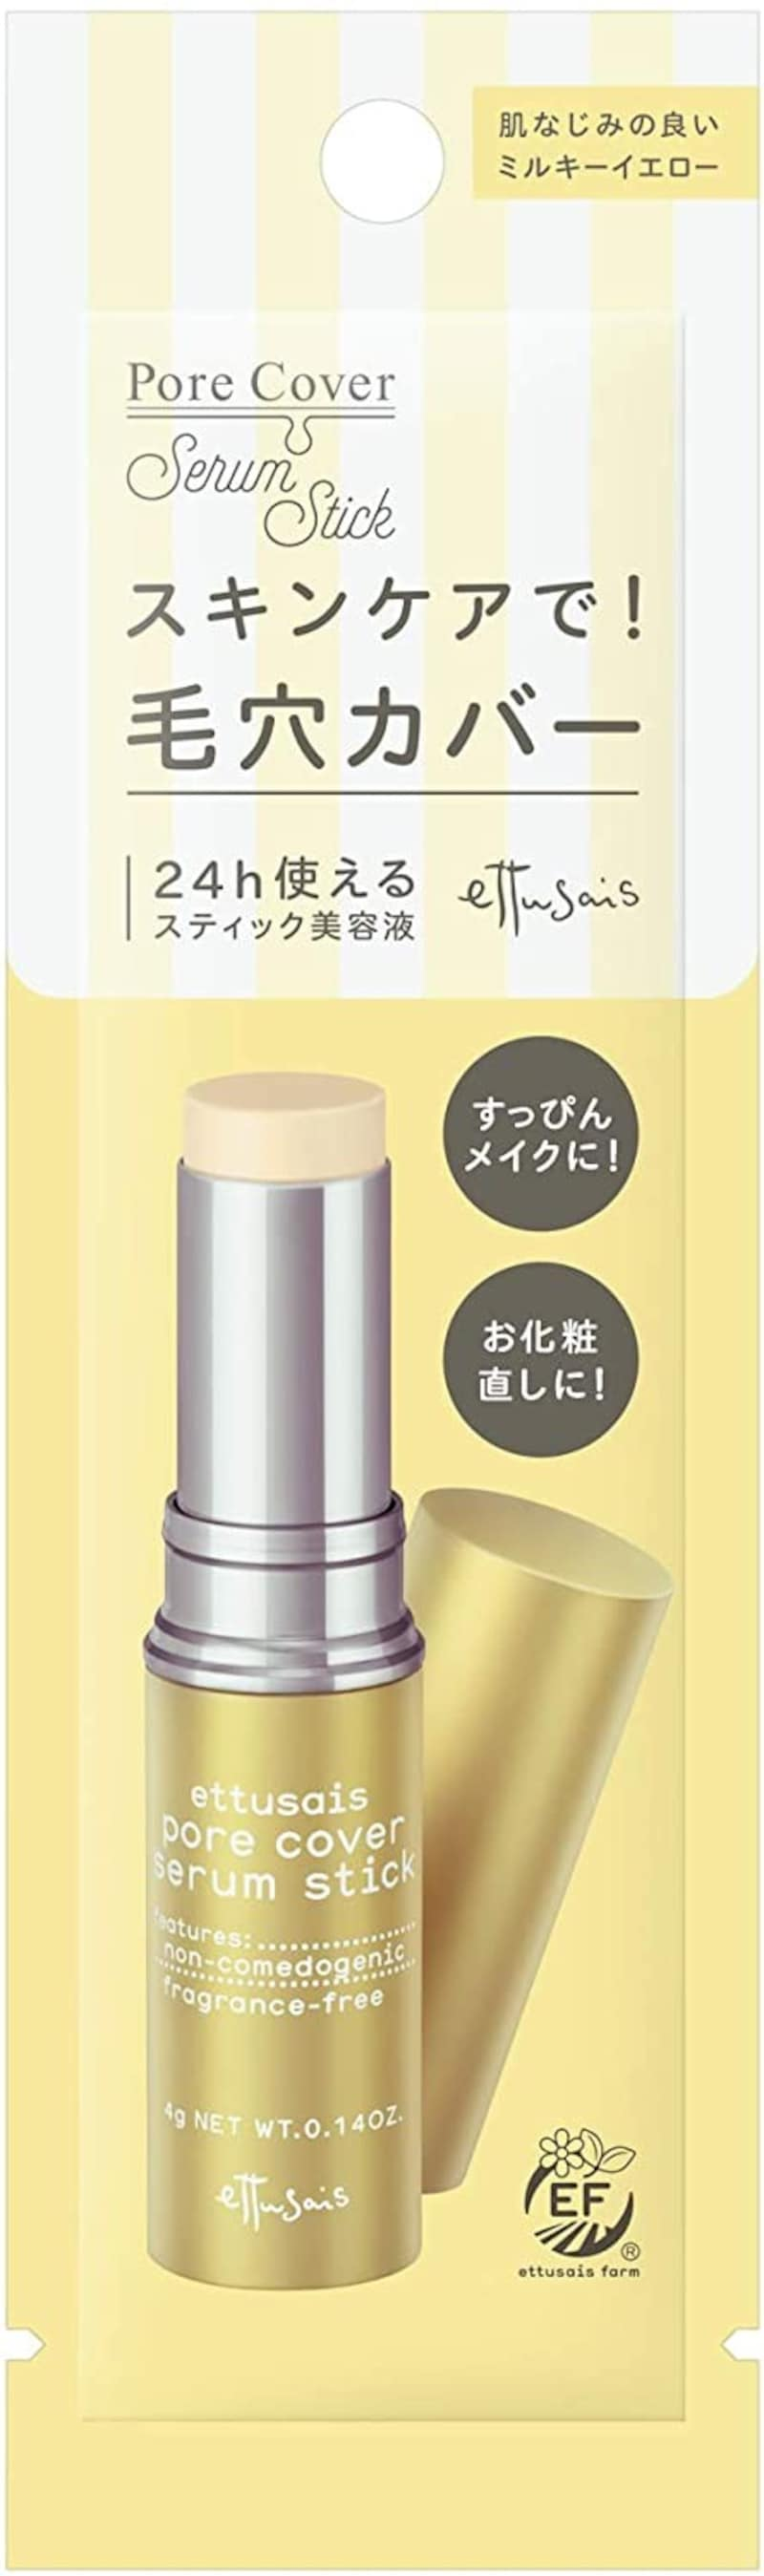 ettusais(エテュセ) ,ポアカバー セラムスティック スティック状美容液